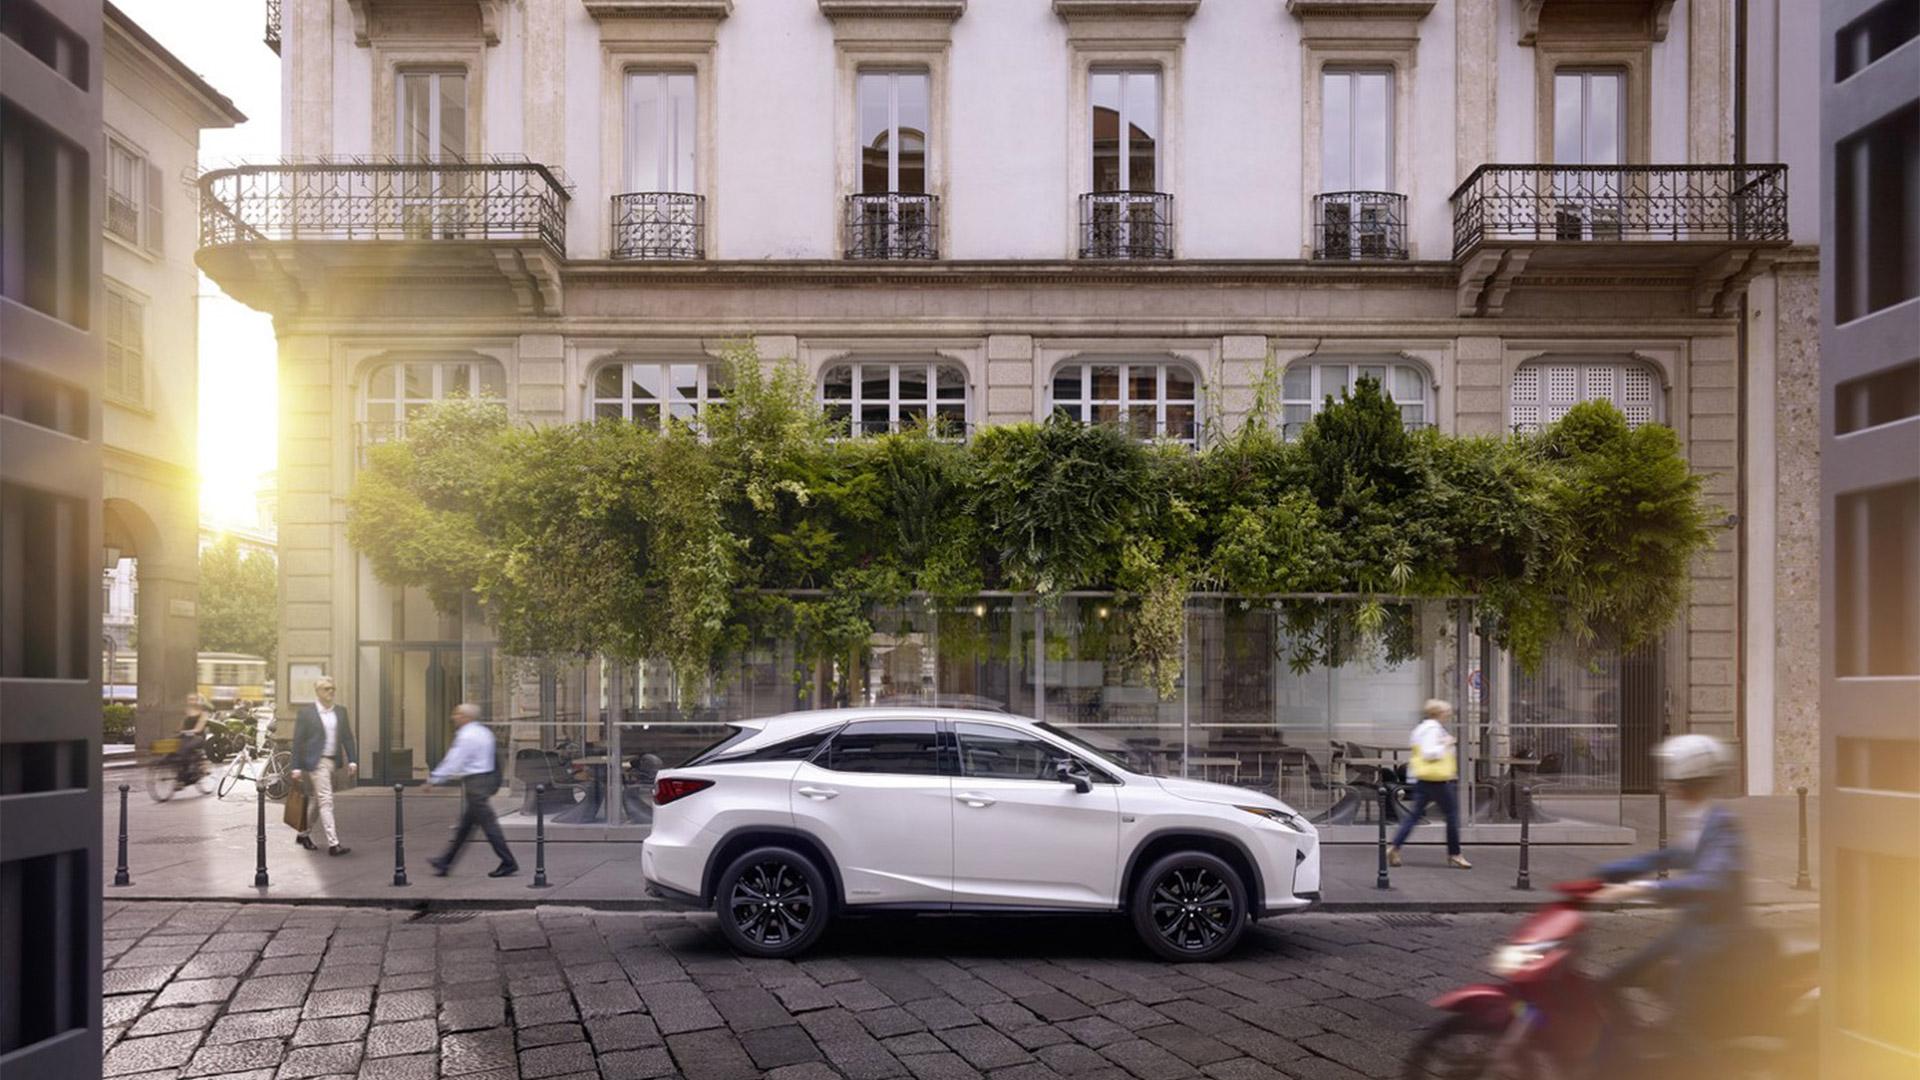 18 2019 020 Lexus RX pionier 1920x1080 galerij